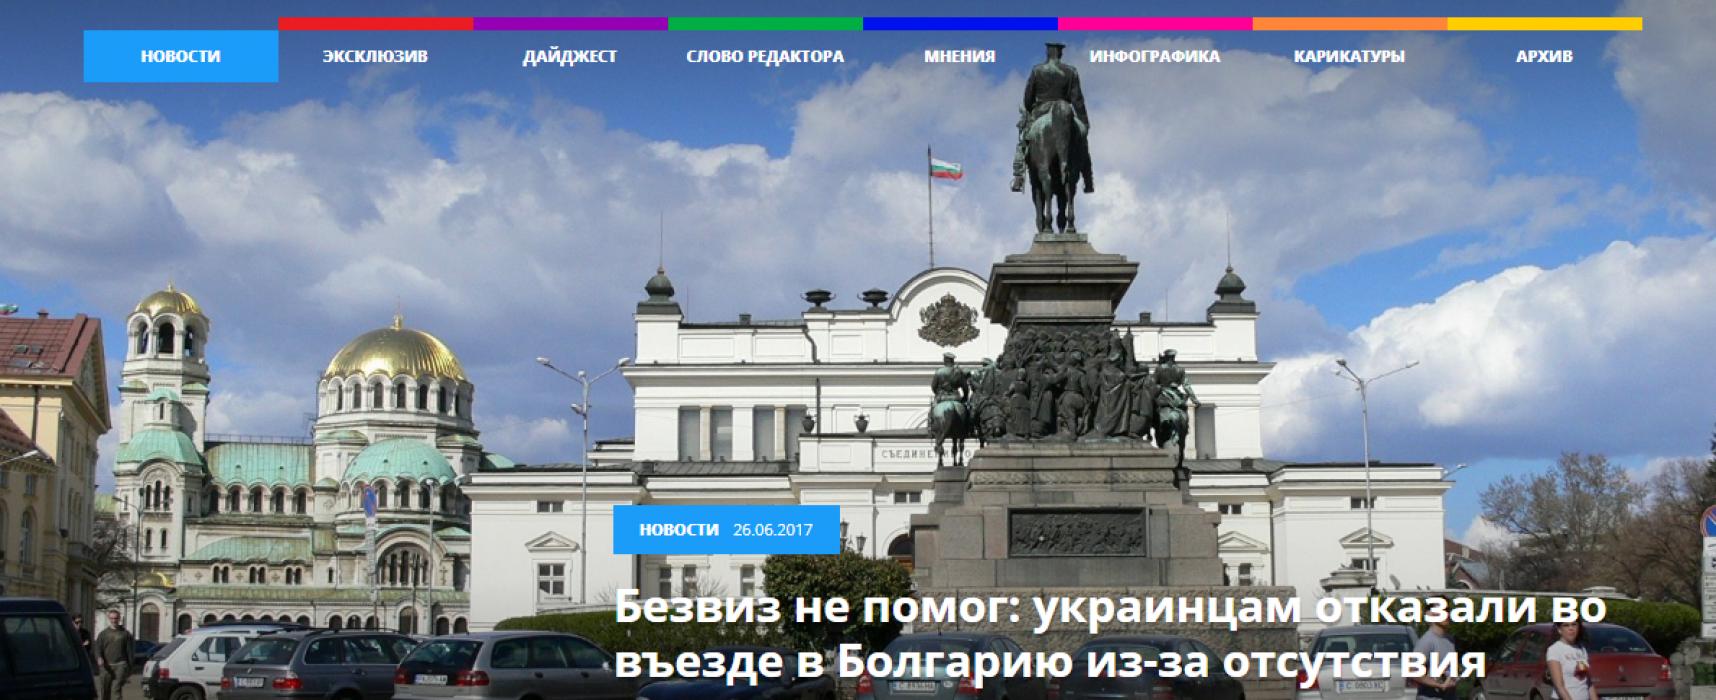 Ukraina Ru X Ukraine Ru 86